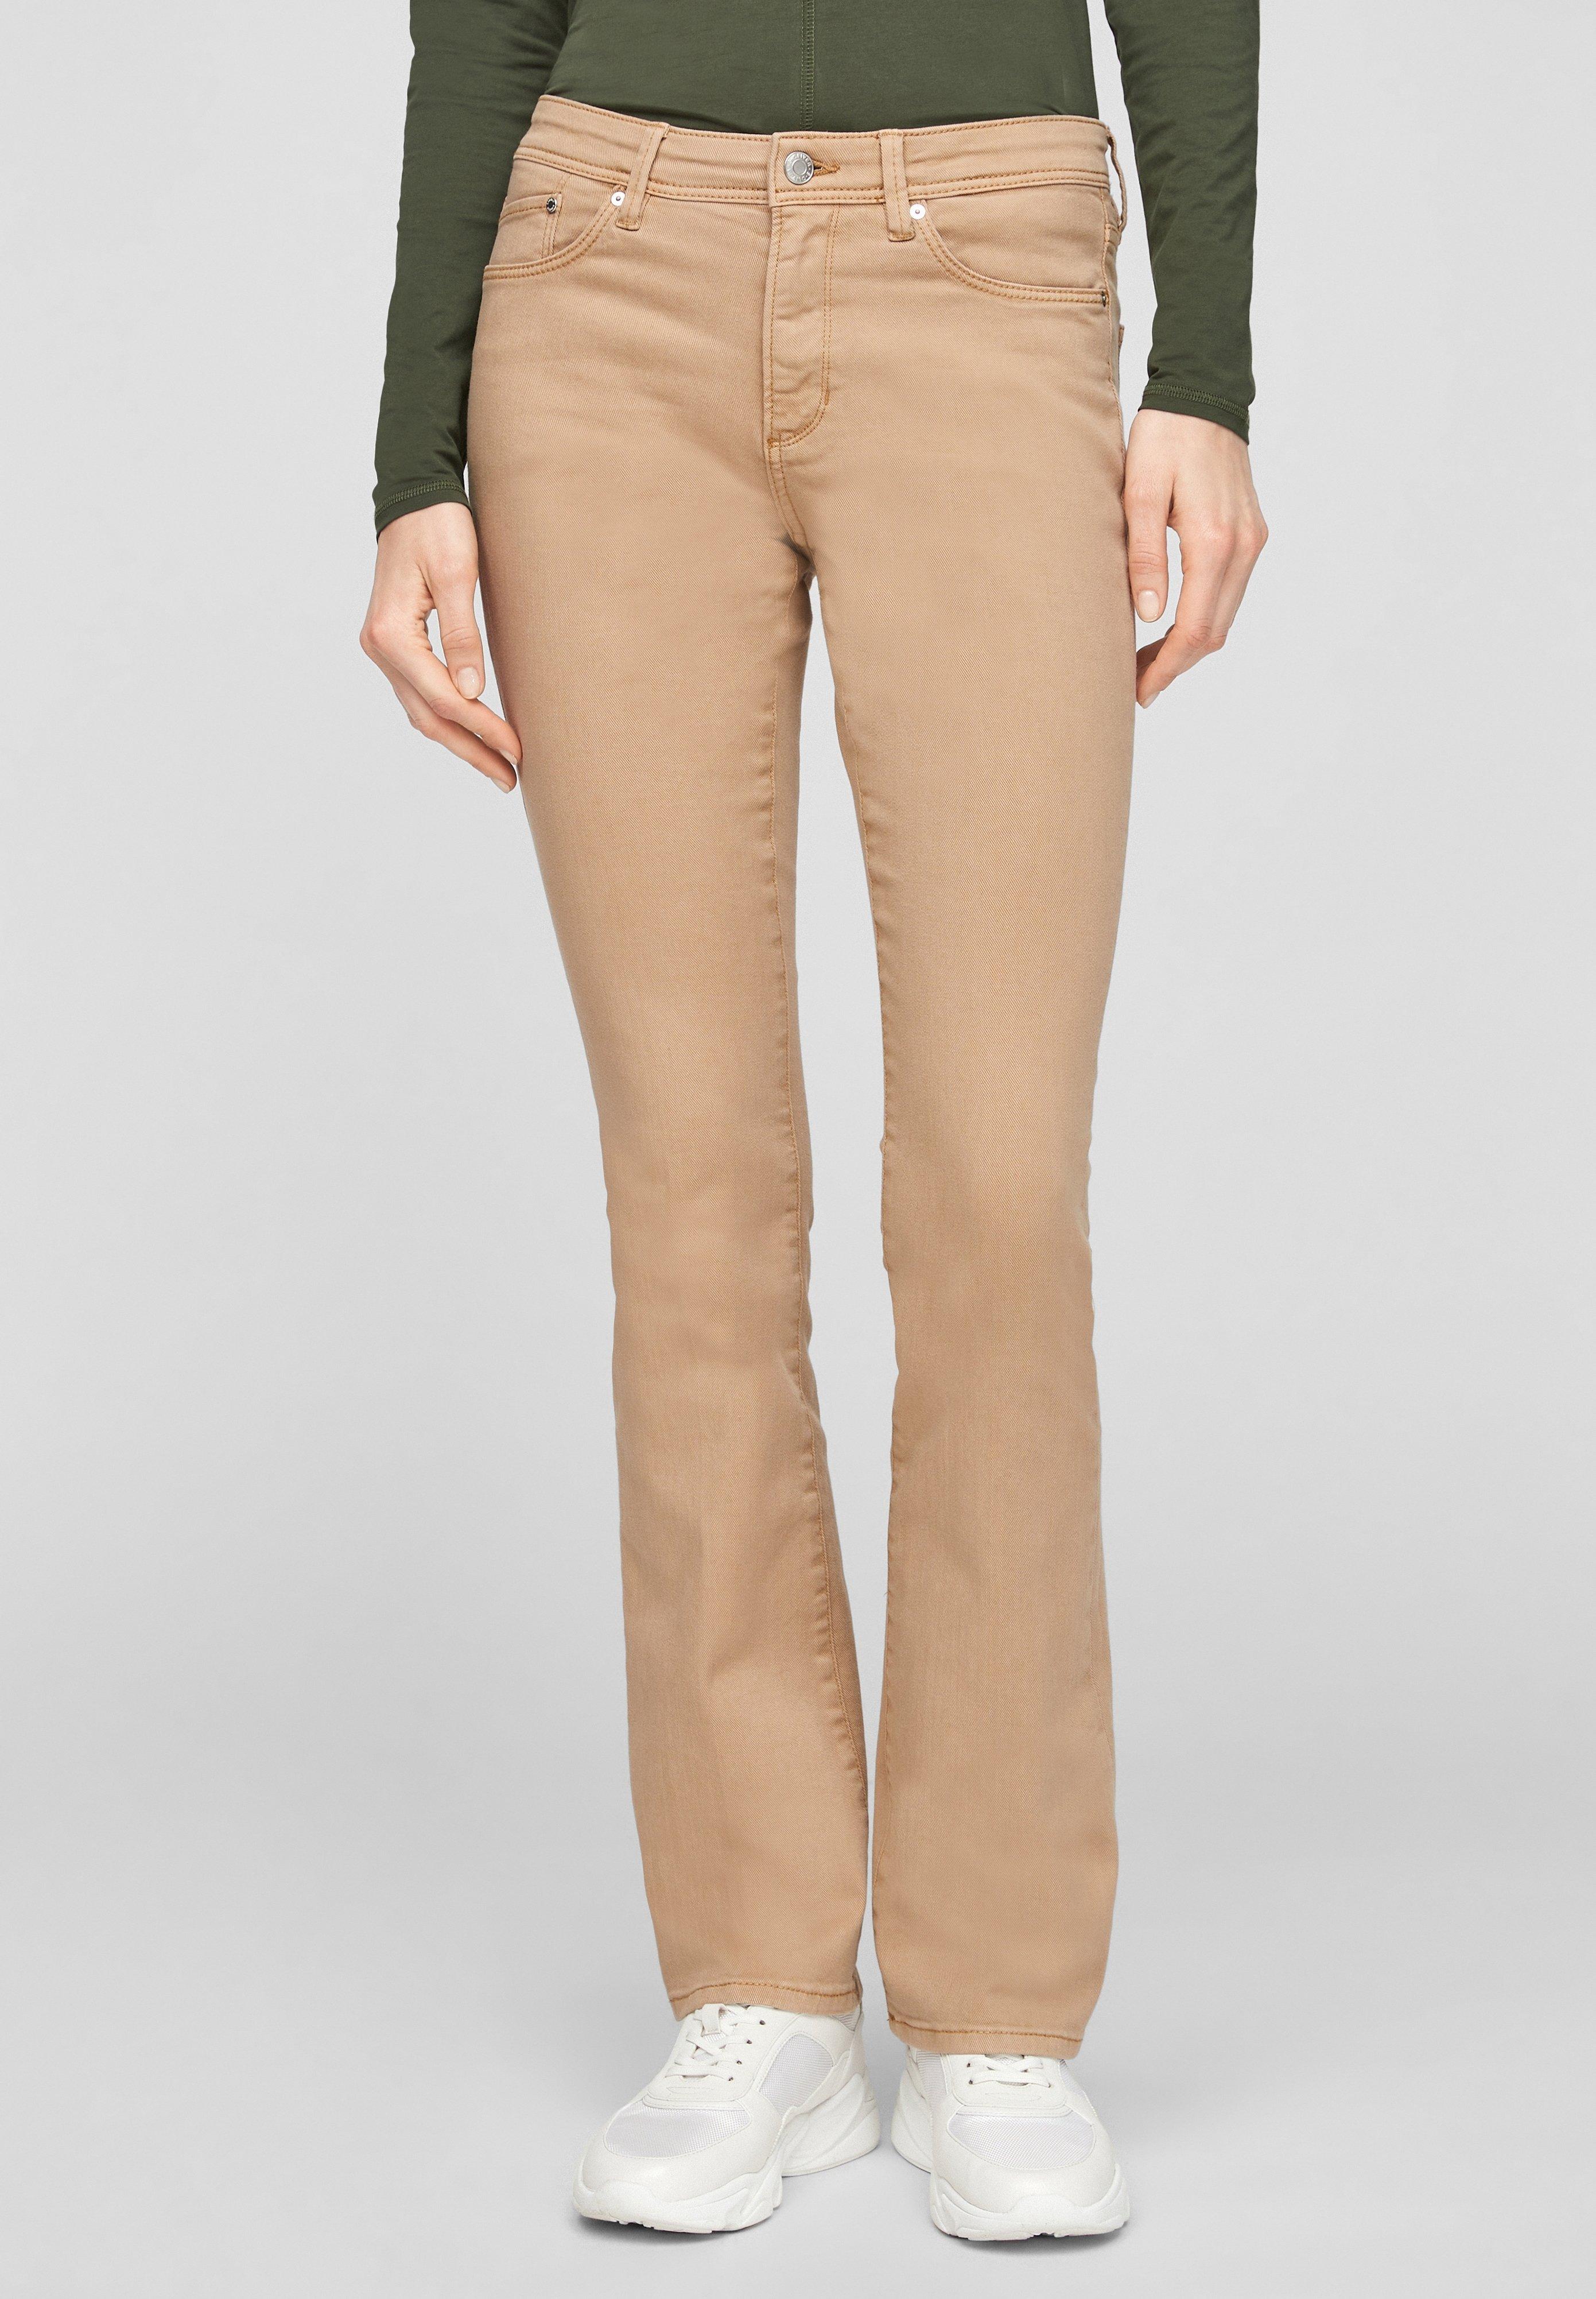 Femme SLIM FIT BOOTCUT  - Jean bootcut